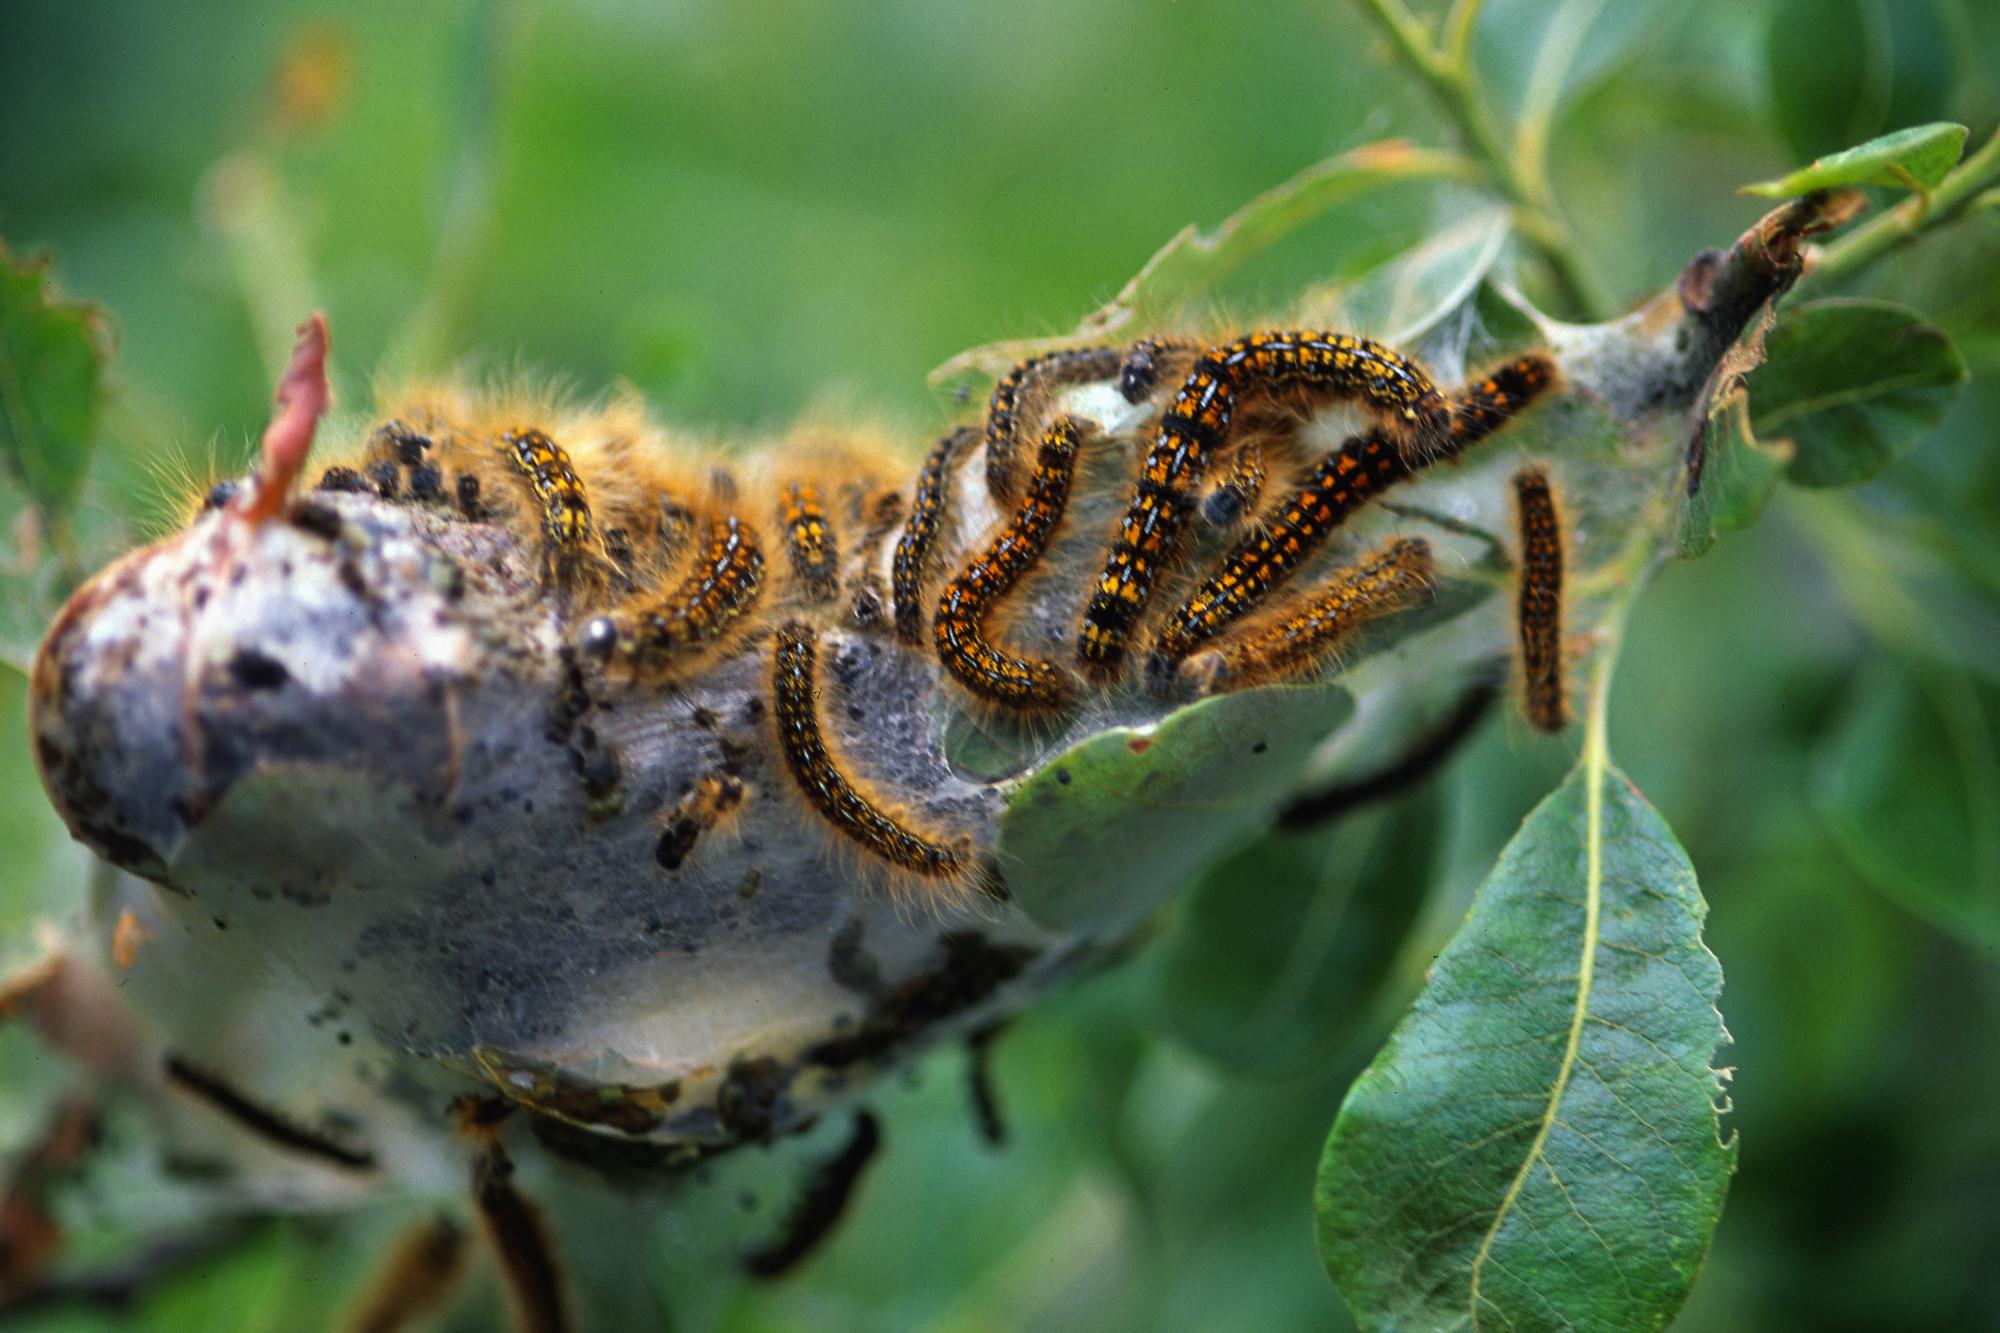 Malacosoma californicum (Western Tent Caterpillar) & California Tent Caterpillar